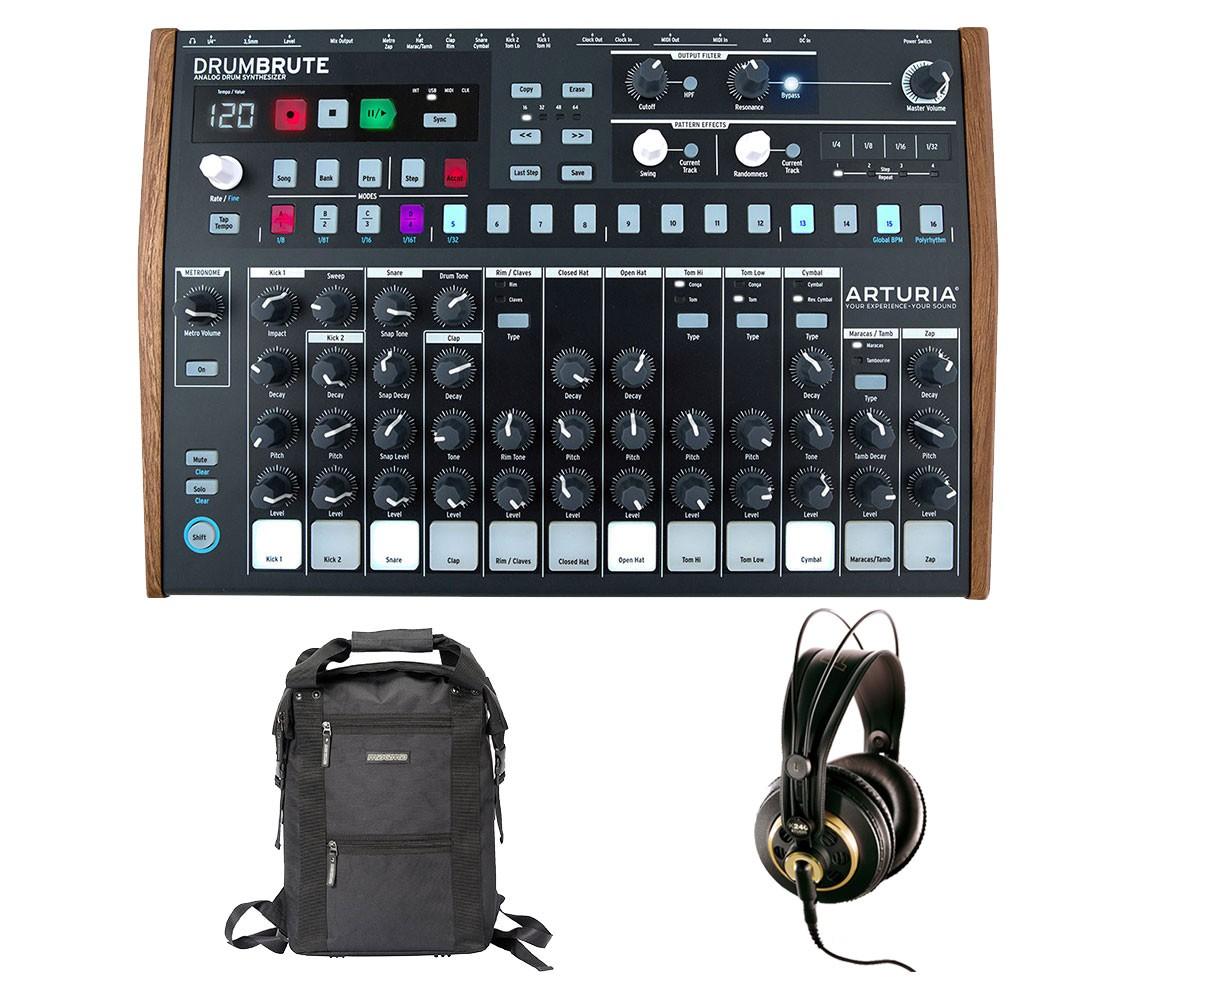 Arturia Drumbrute + AKG K 240 Studio + Bag